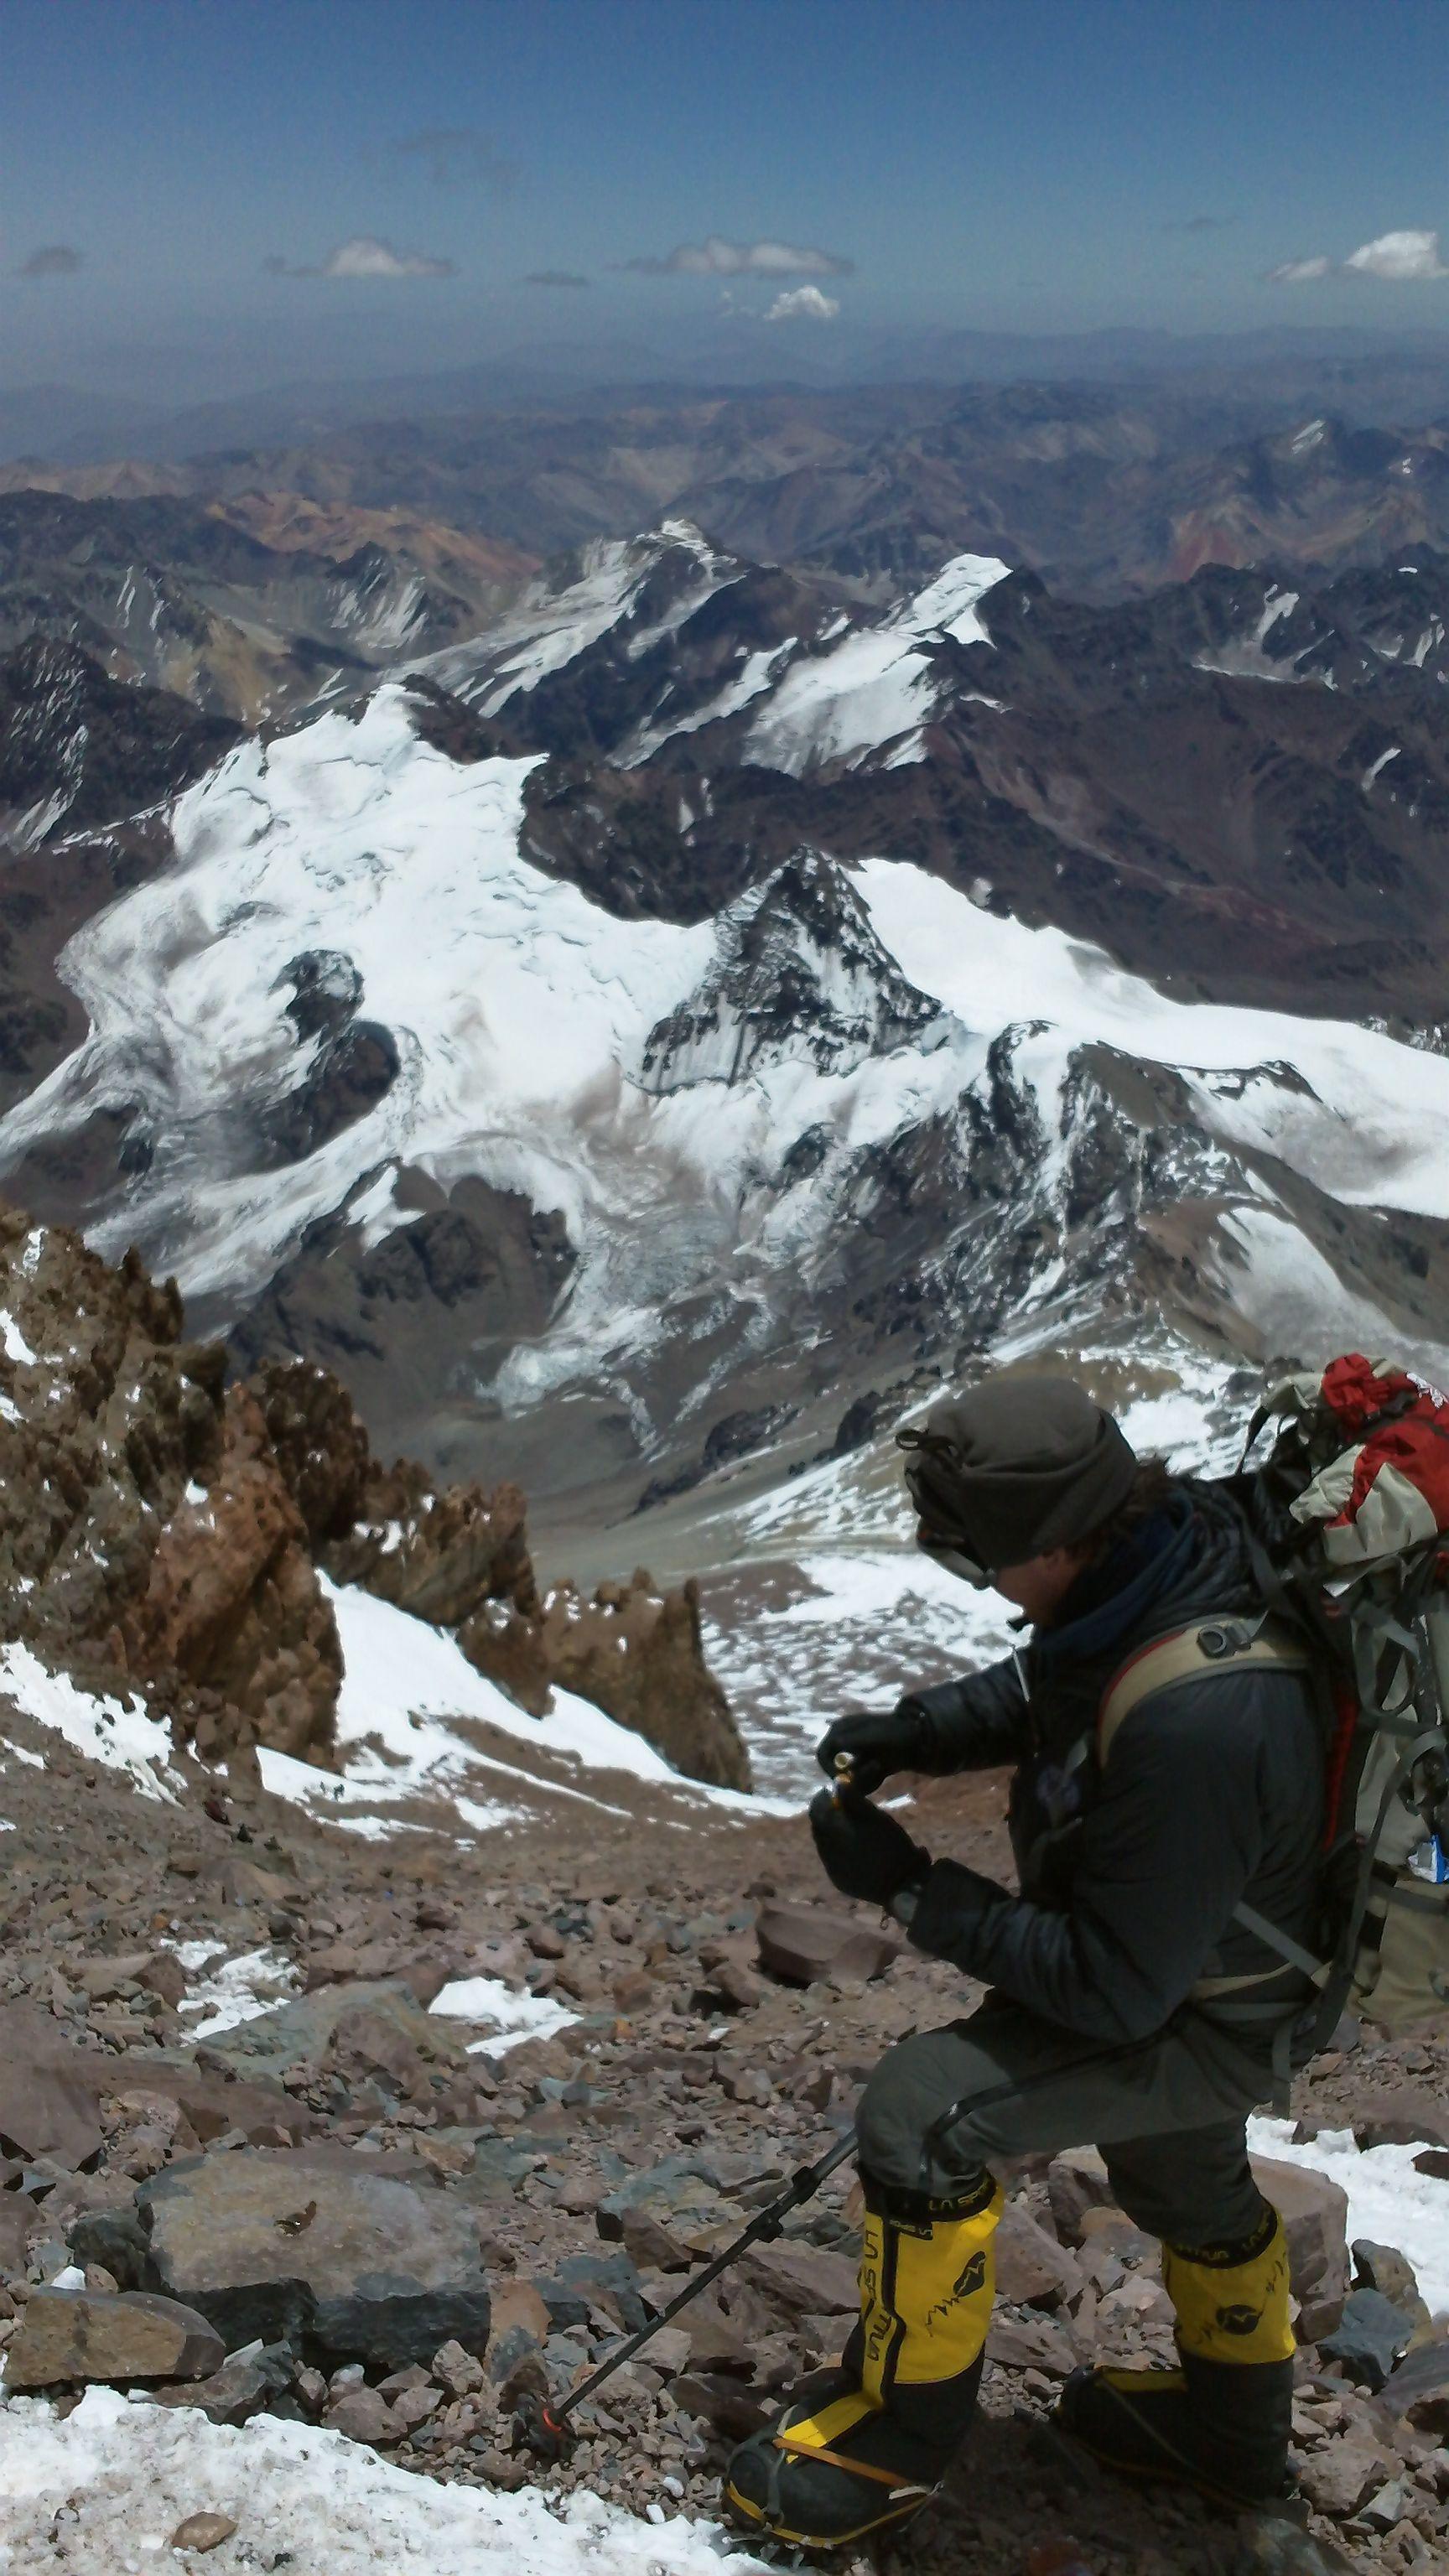 Nearing the summit on Aconcagua, Argentina